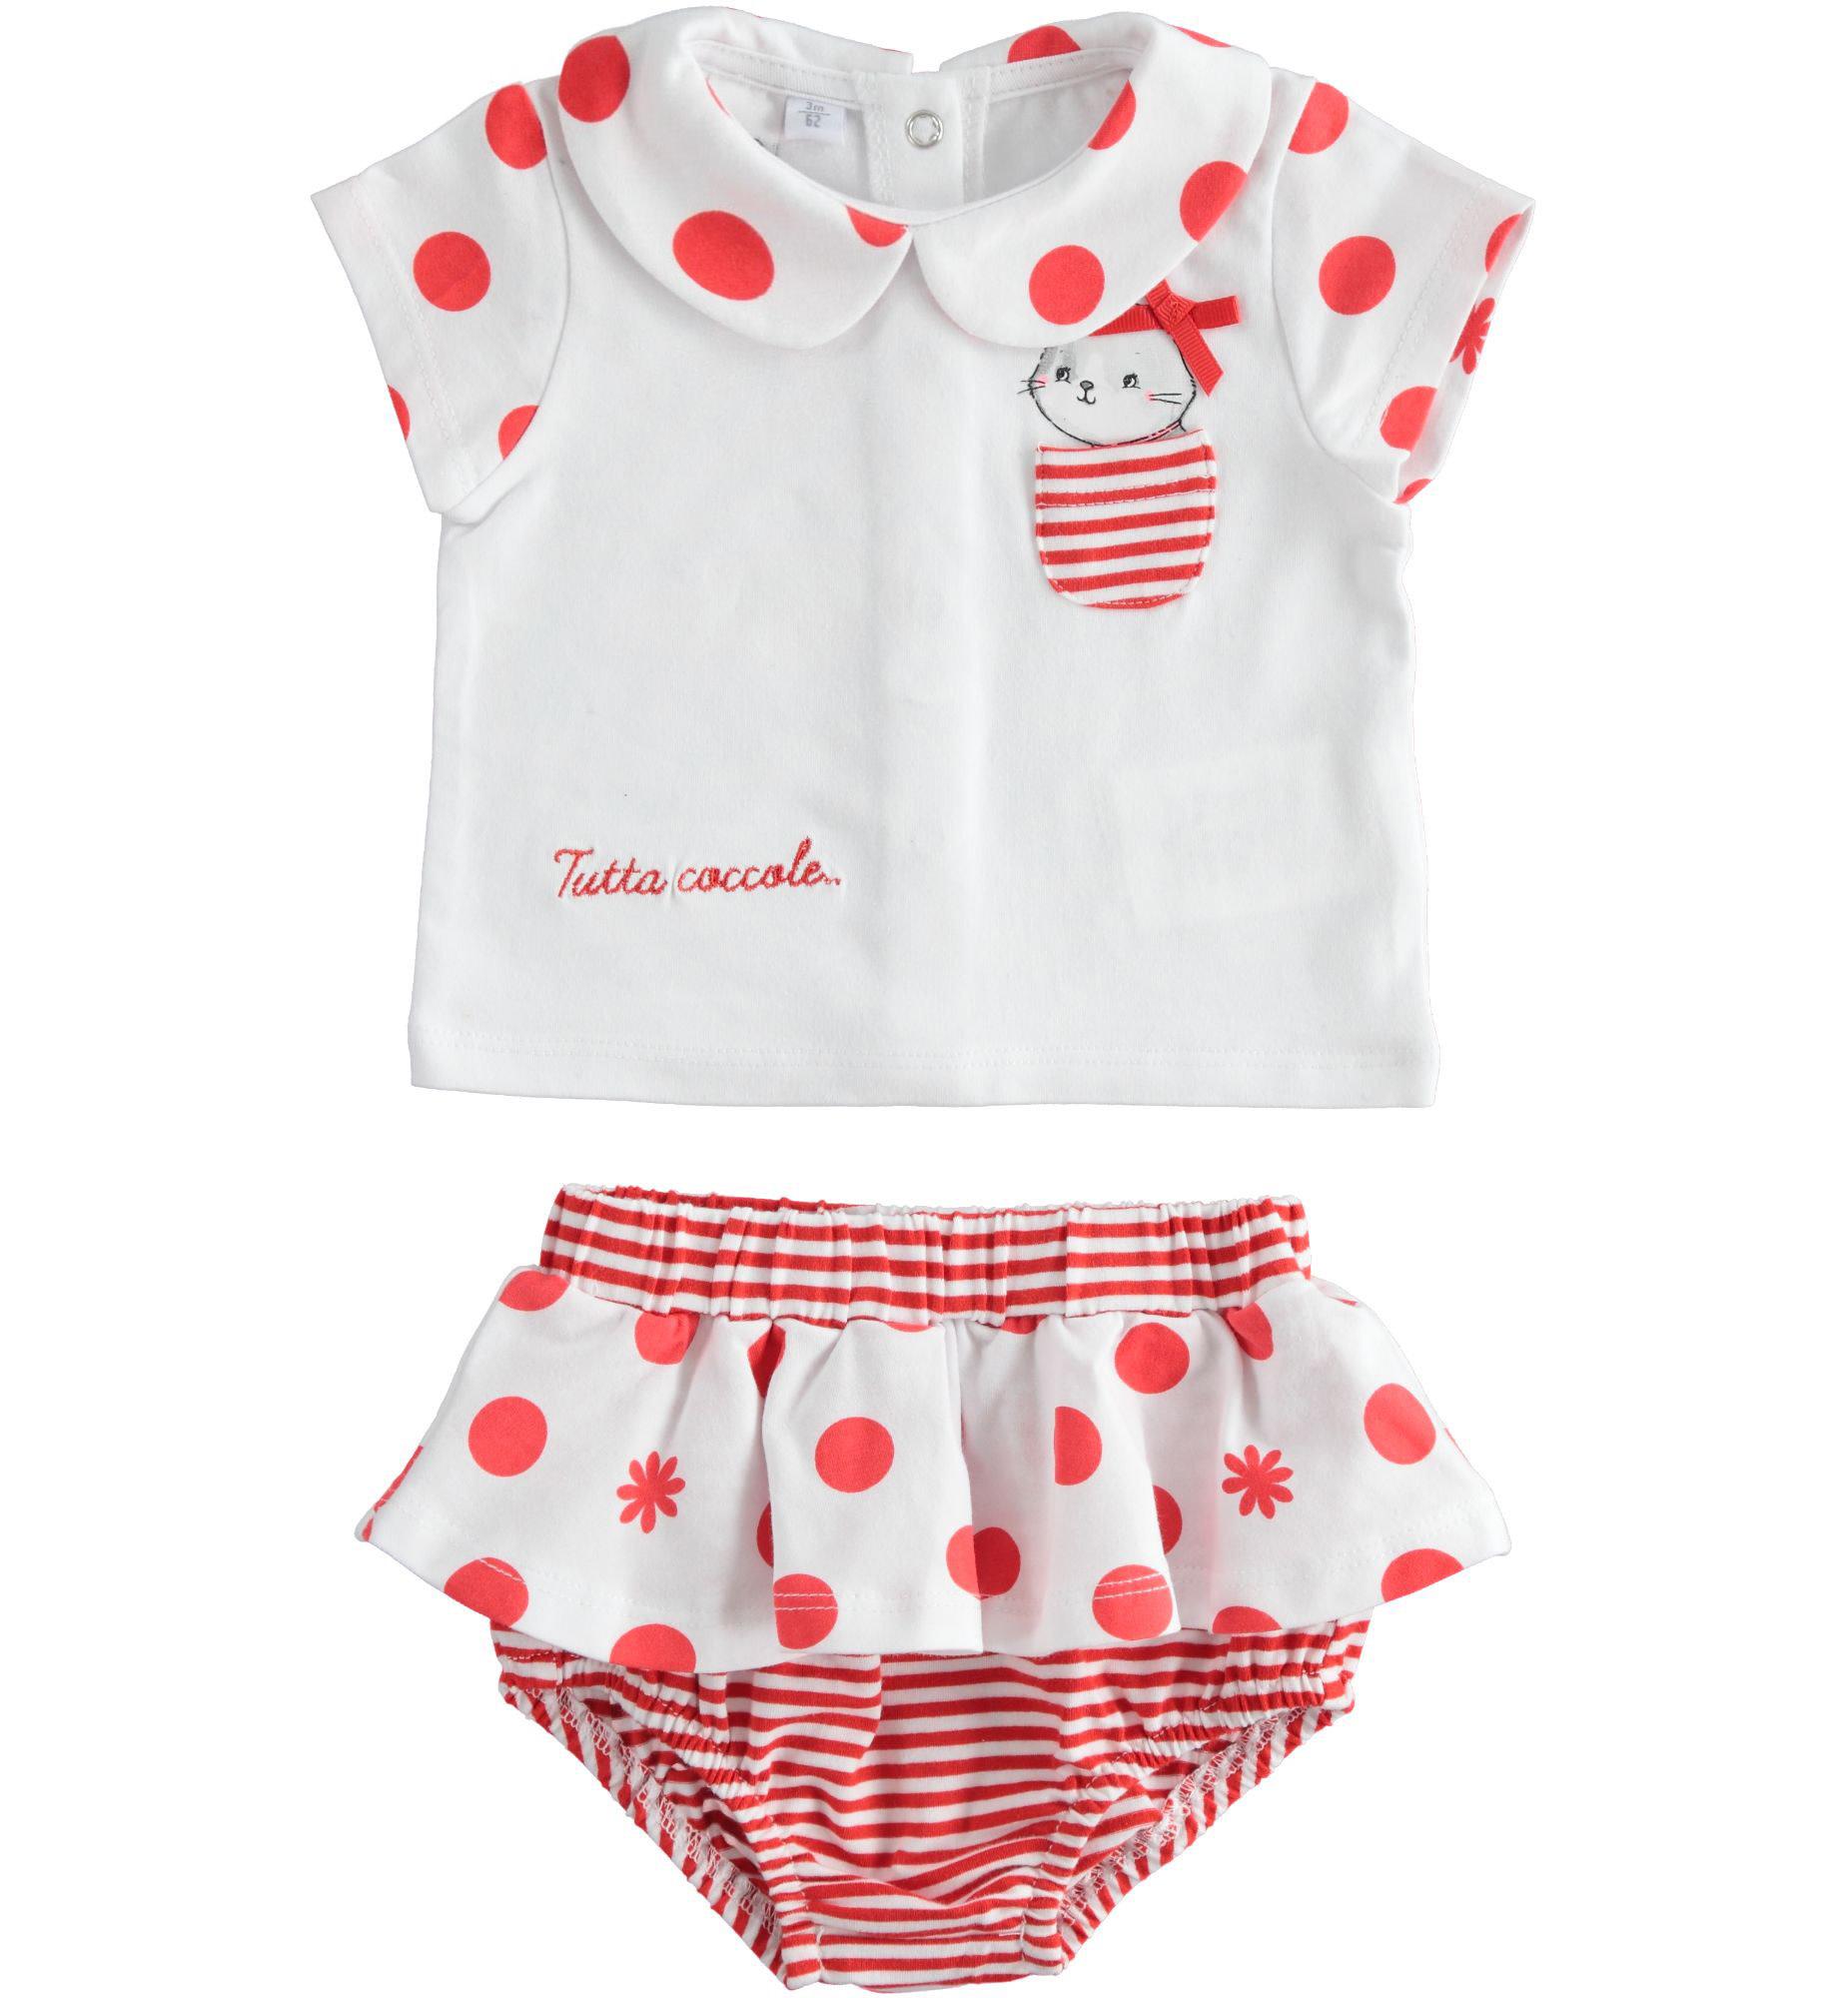 iDo iDO SS20 Girls Red & White 2 Piece Set J144